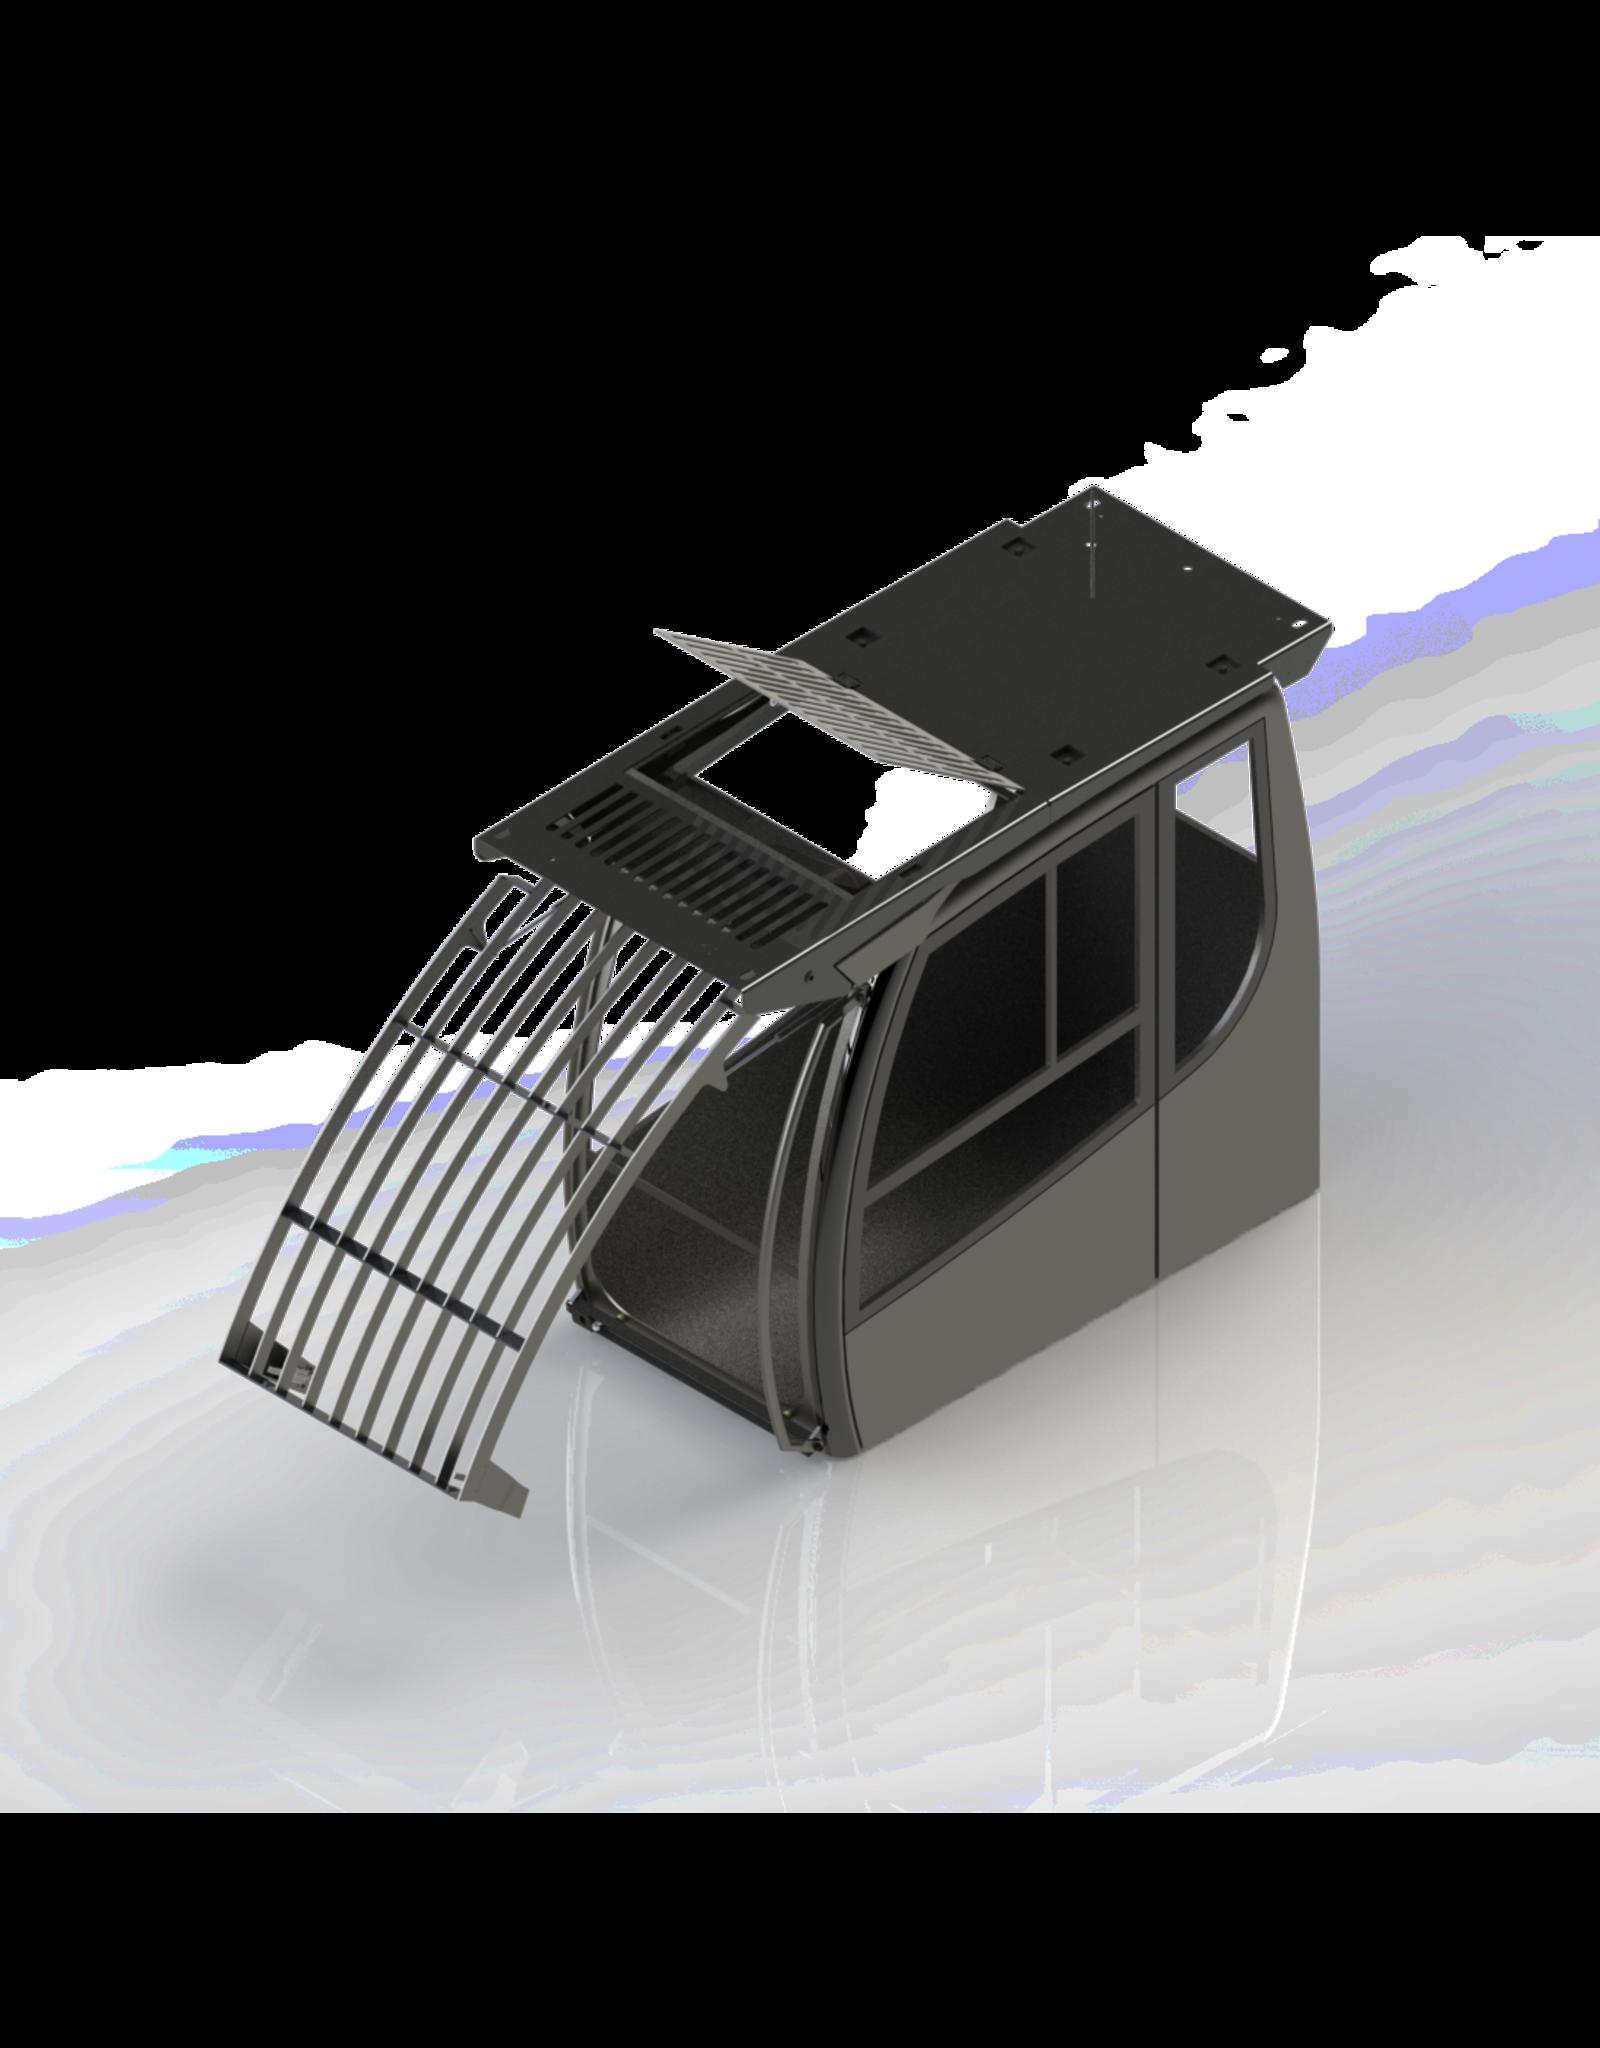 Echle Hartstahl GmbH FOPS for Komatsu PC240LC-10/11